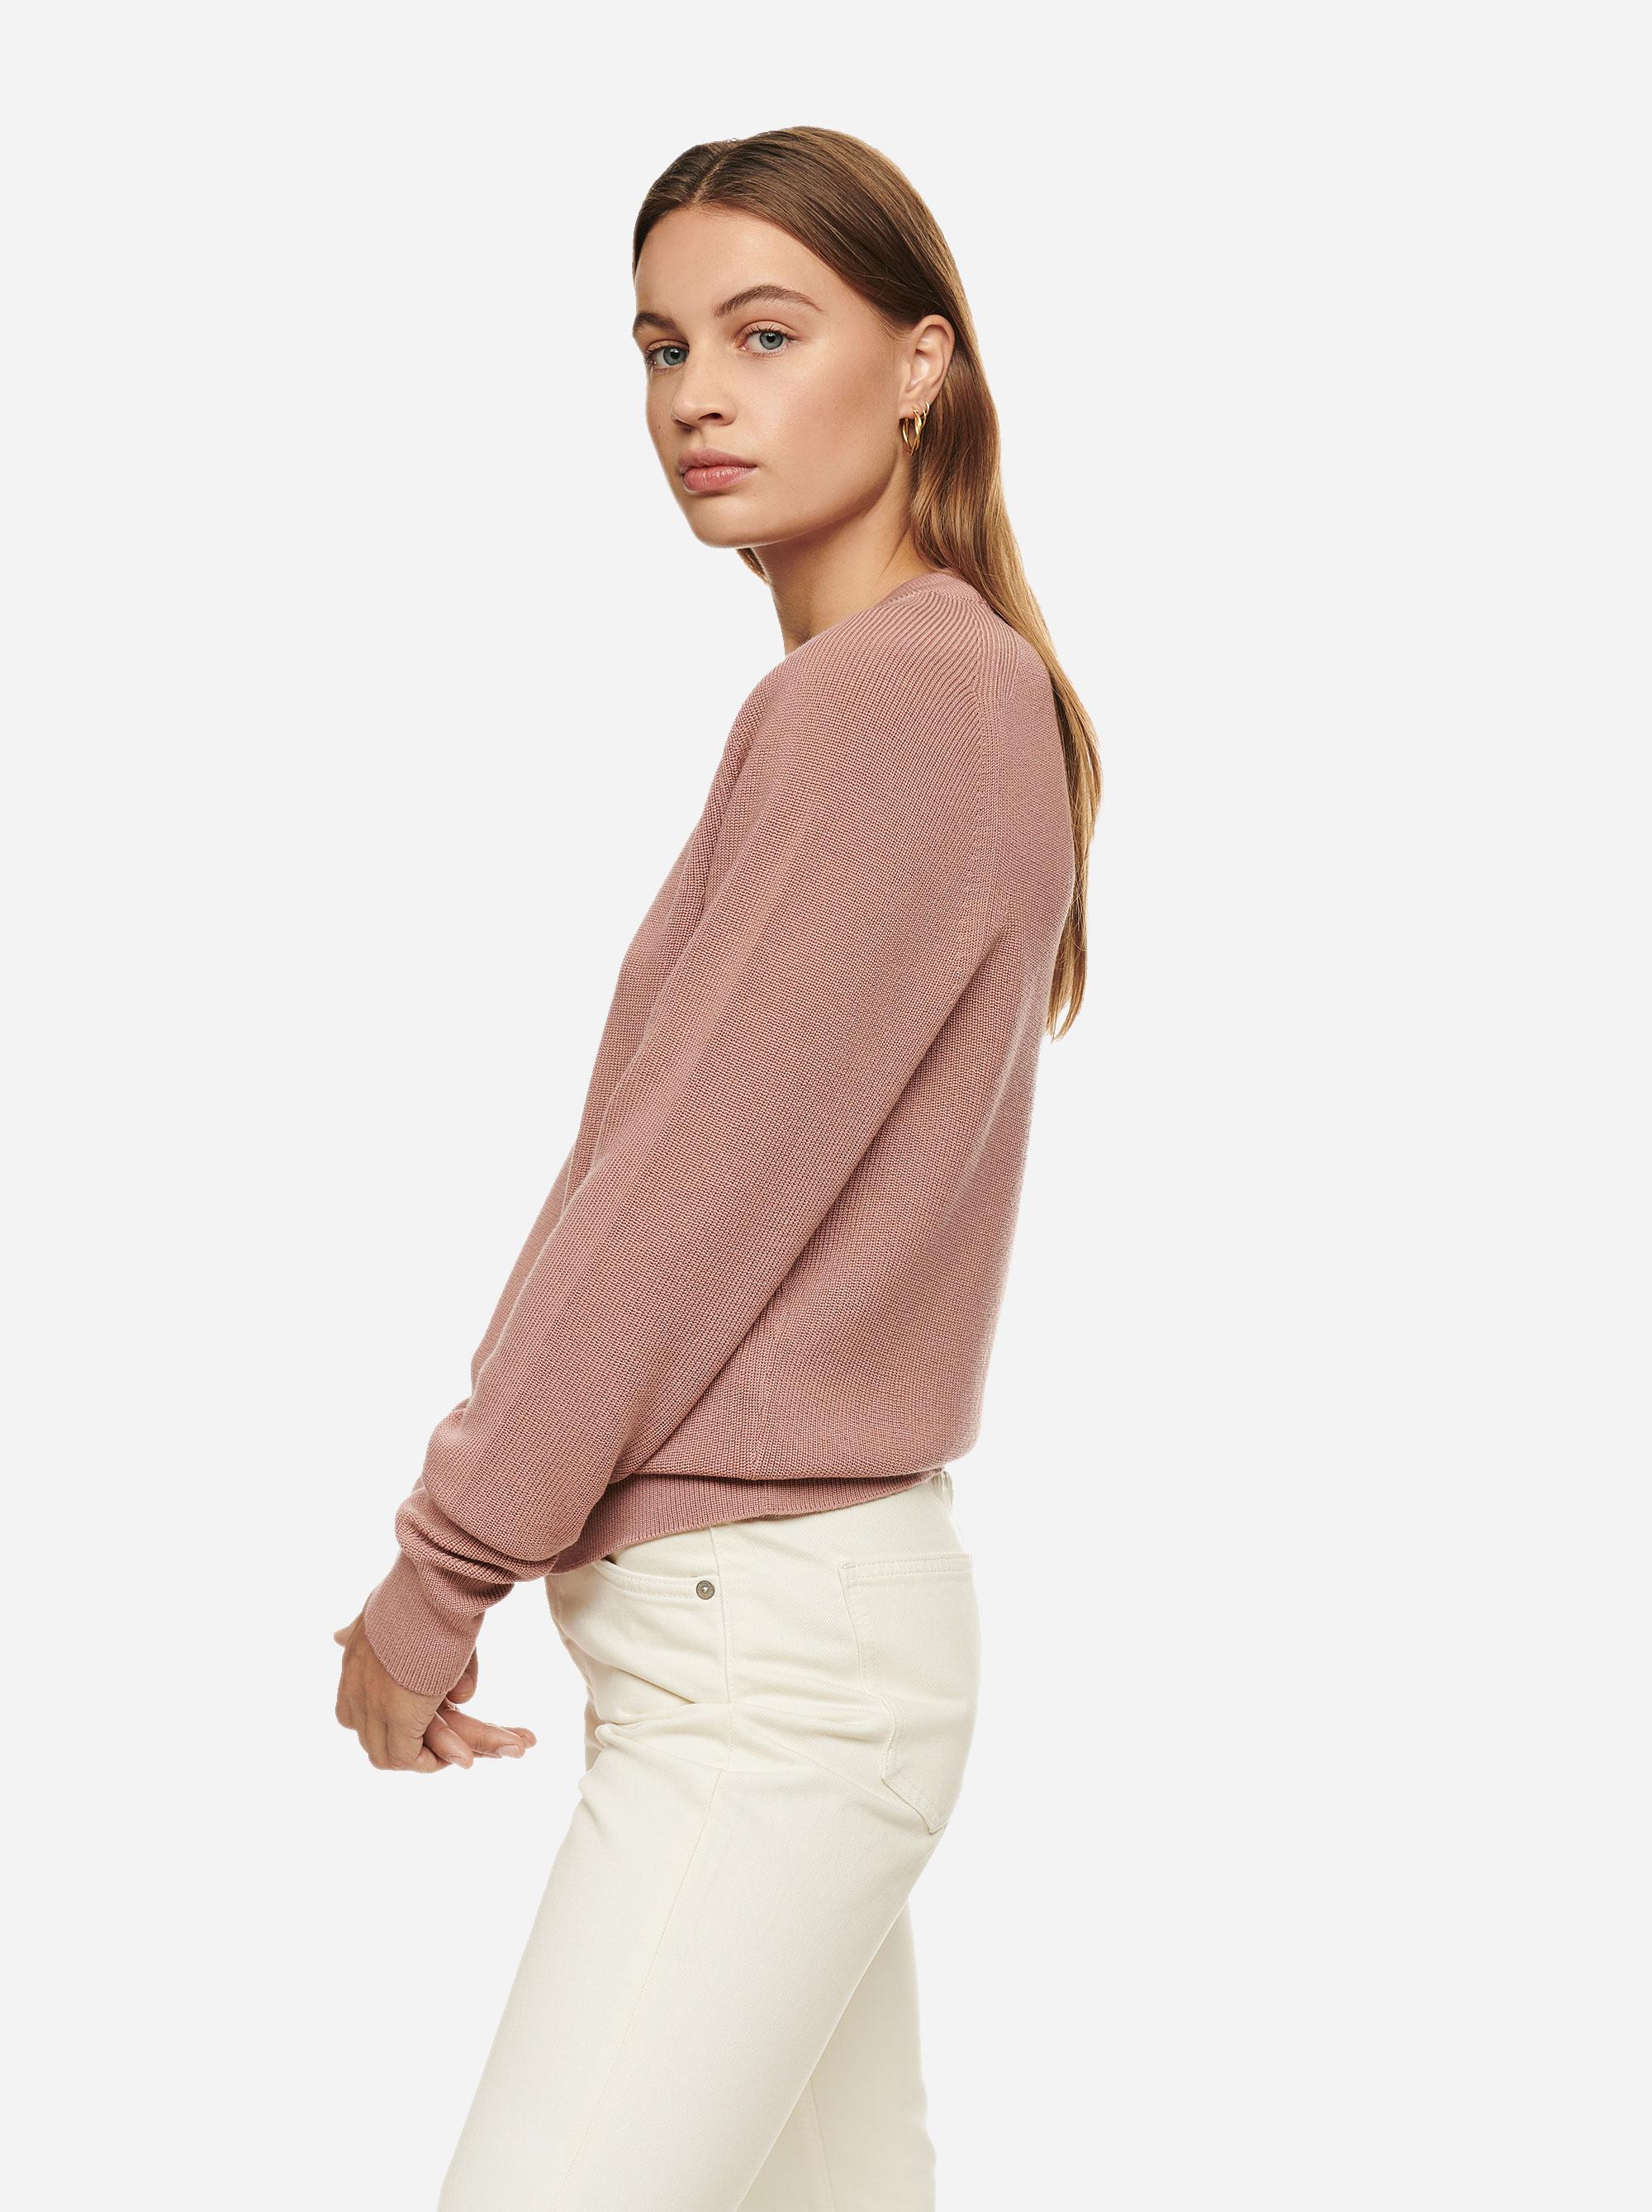 Teym - Crewneck - The Merino Sweater - Women - Pink - 2